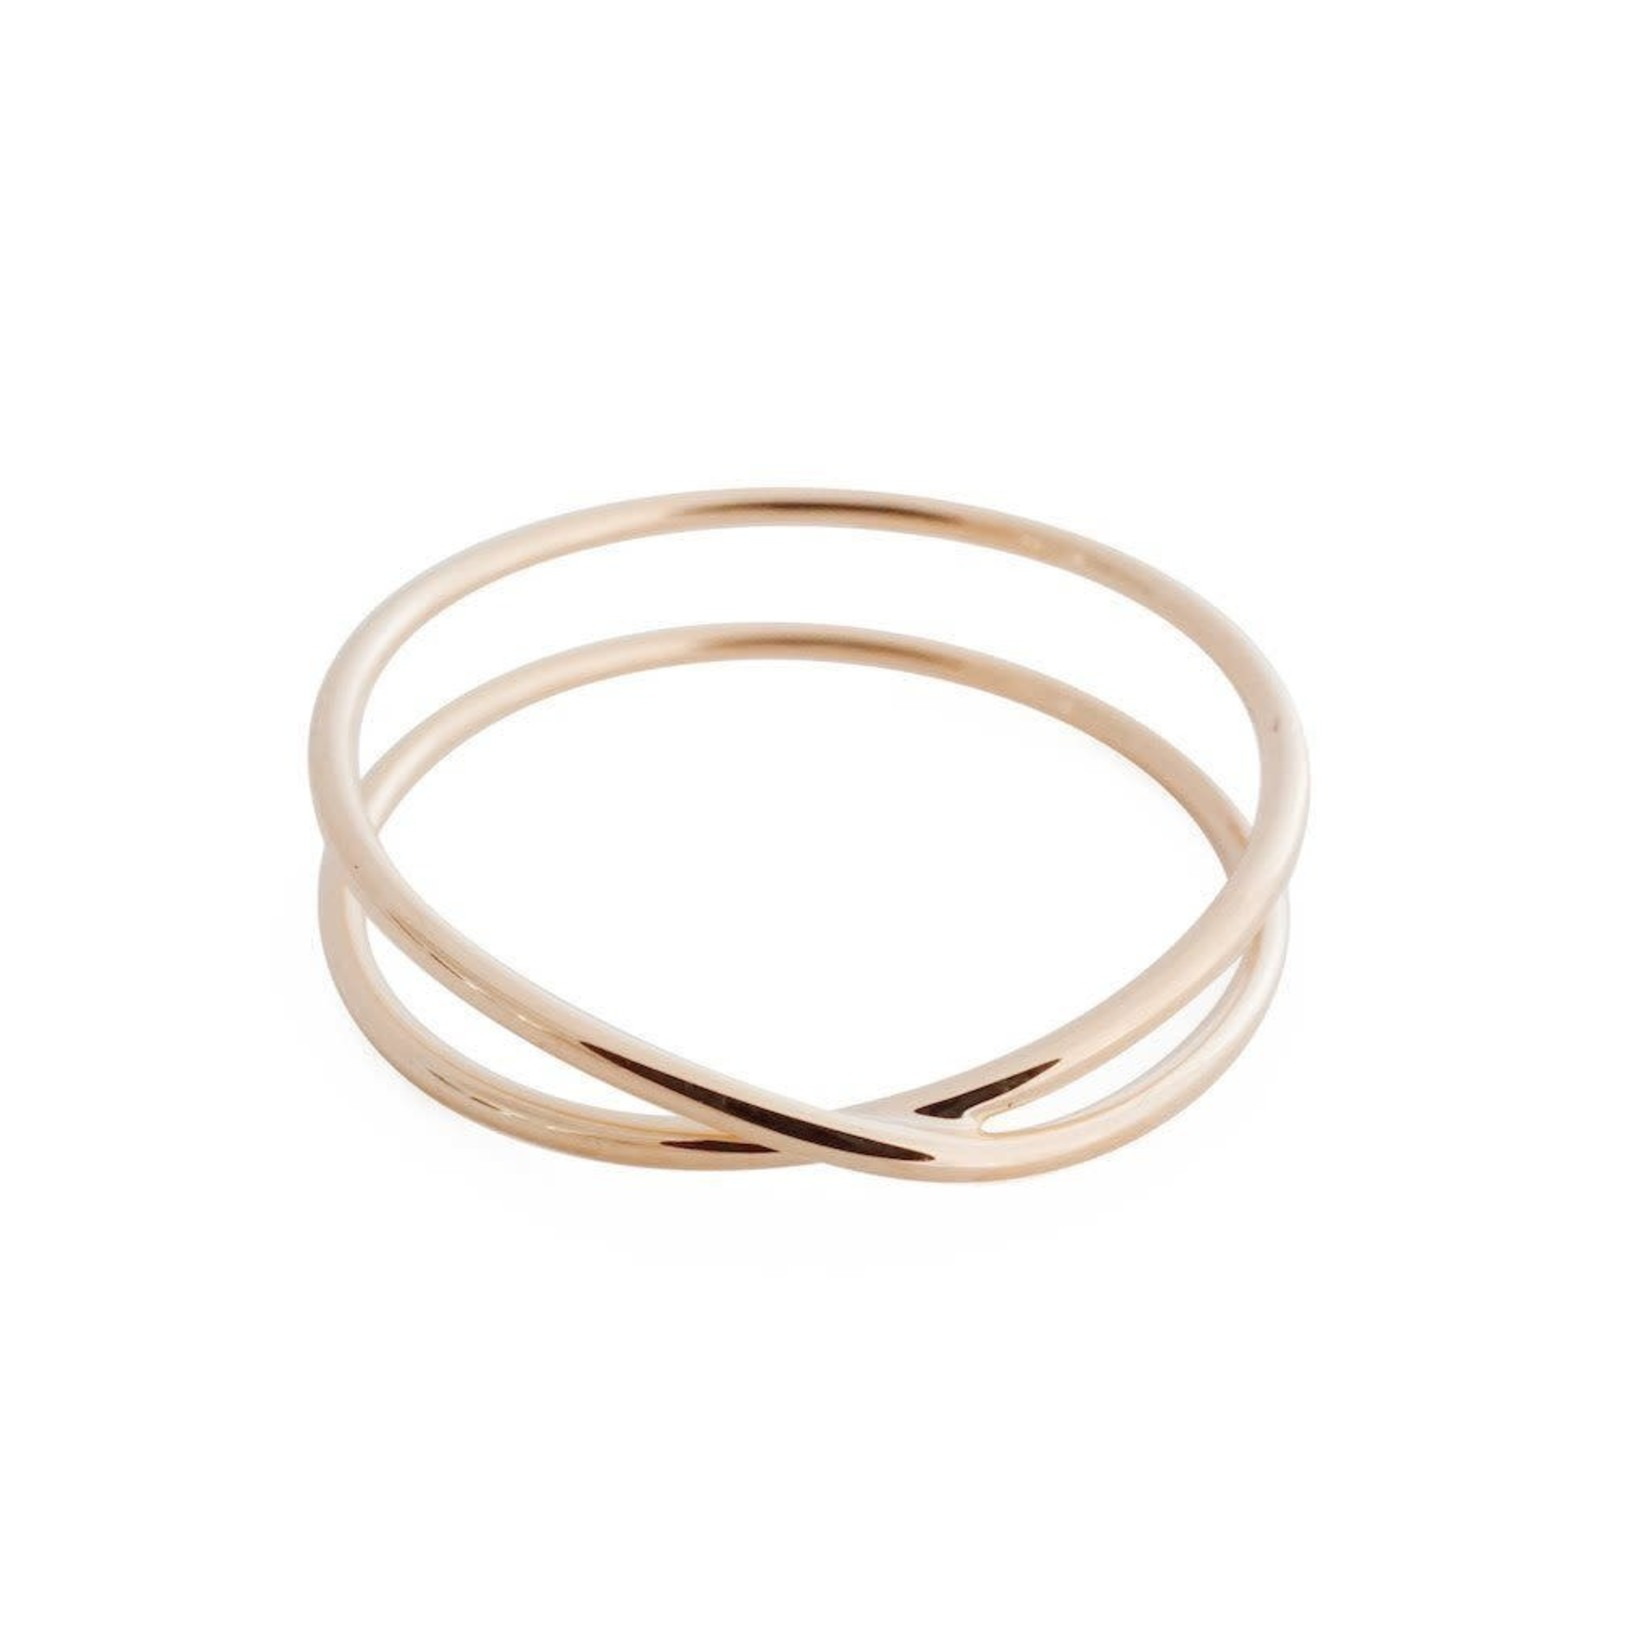 Honeycat Jewelry Honeycat Crossover X Ring Rose Gold